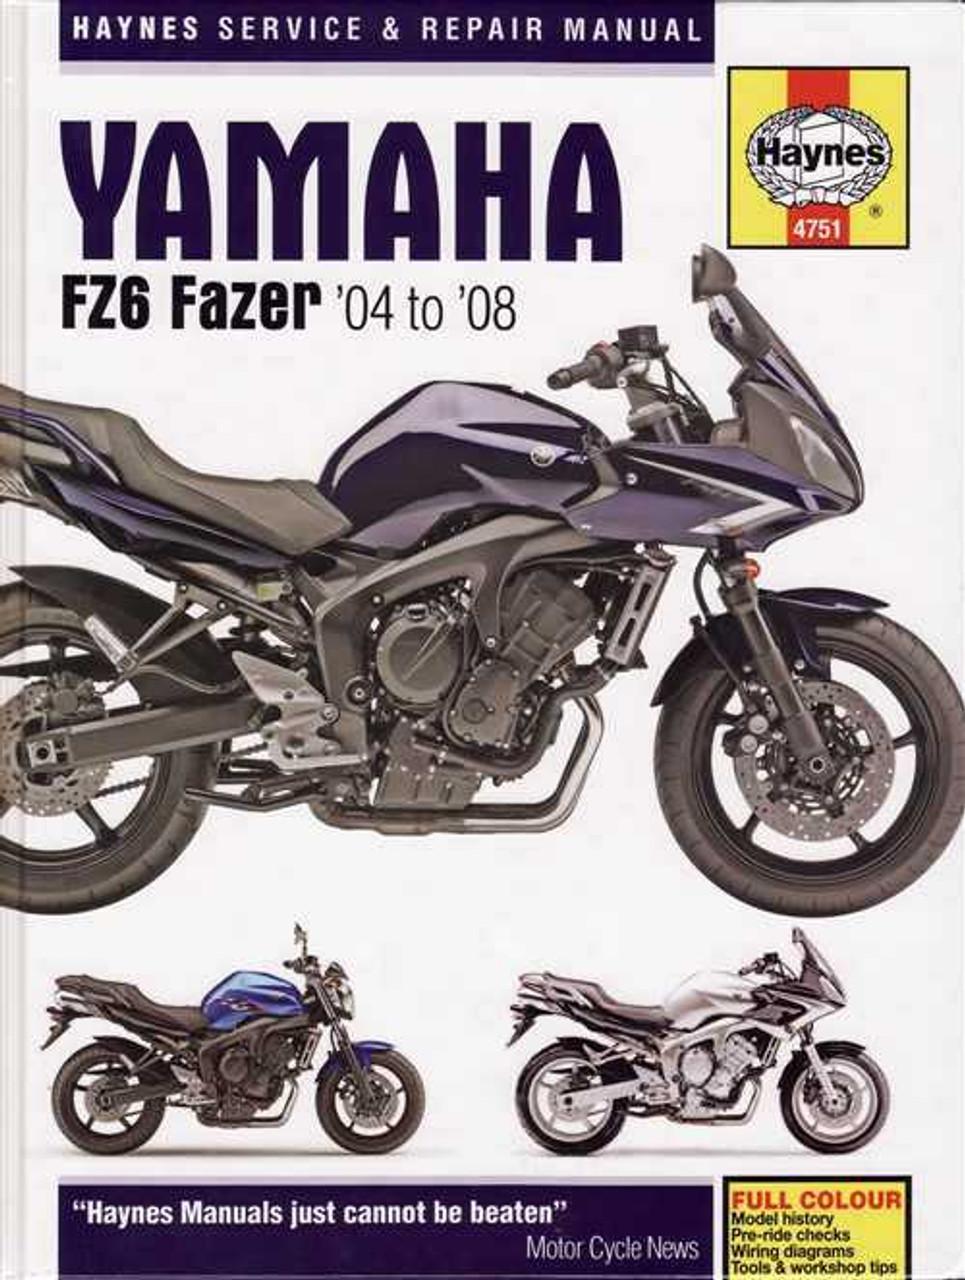 Fz600 Service Manual